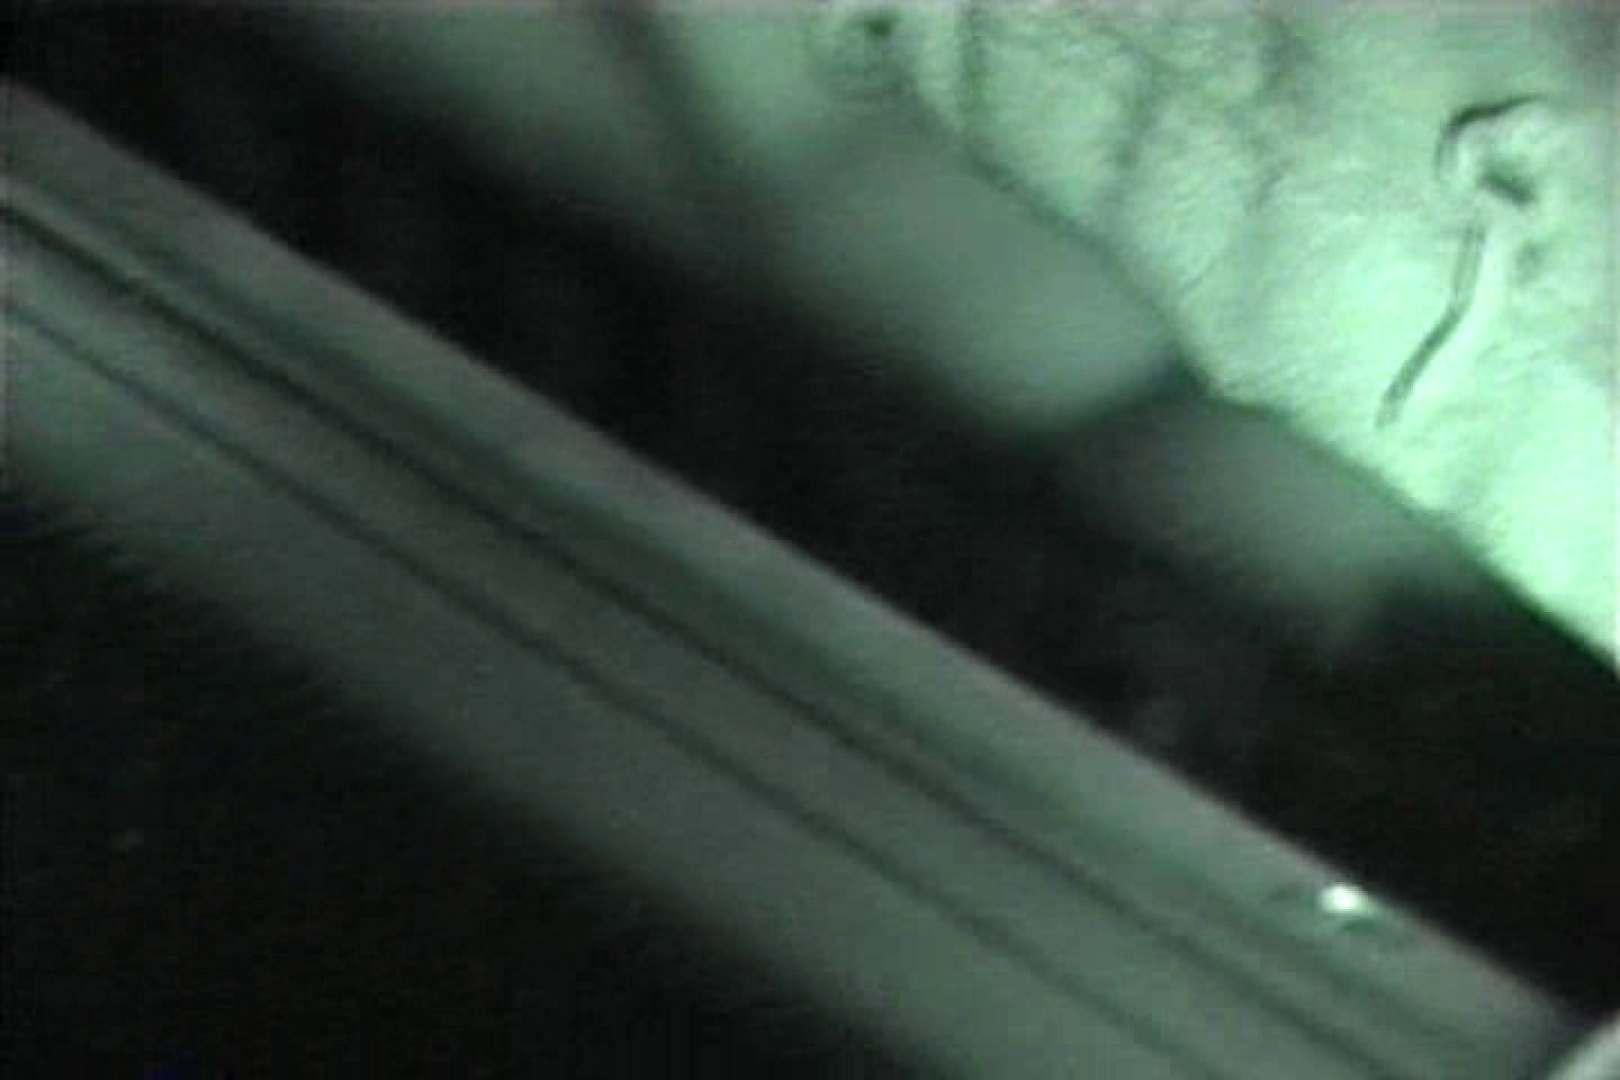 MASAさんの待ち伏せ撮り! 赤外線カーセックスVol.7 赤外線 ワレメ動画紹介 60pic 35